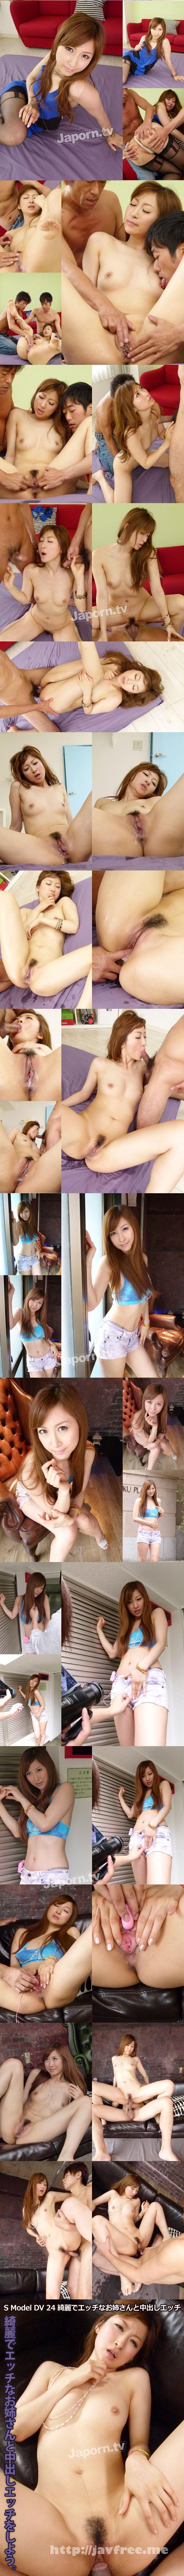 [SMDV 24] S Model DV 24 綺麗でエッチなお姉さんと中出しエッチ : 愛咲れいら 愛咲れいら SMDV Reira Aisaki